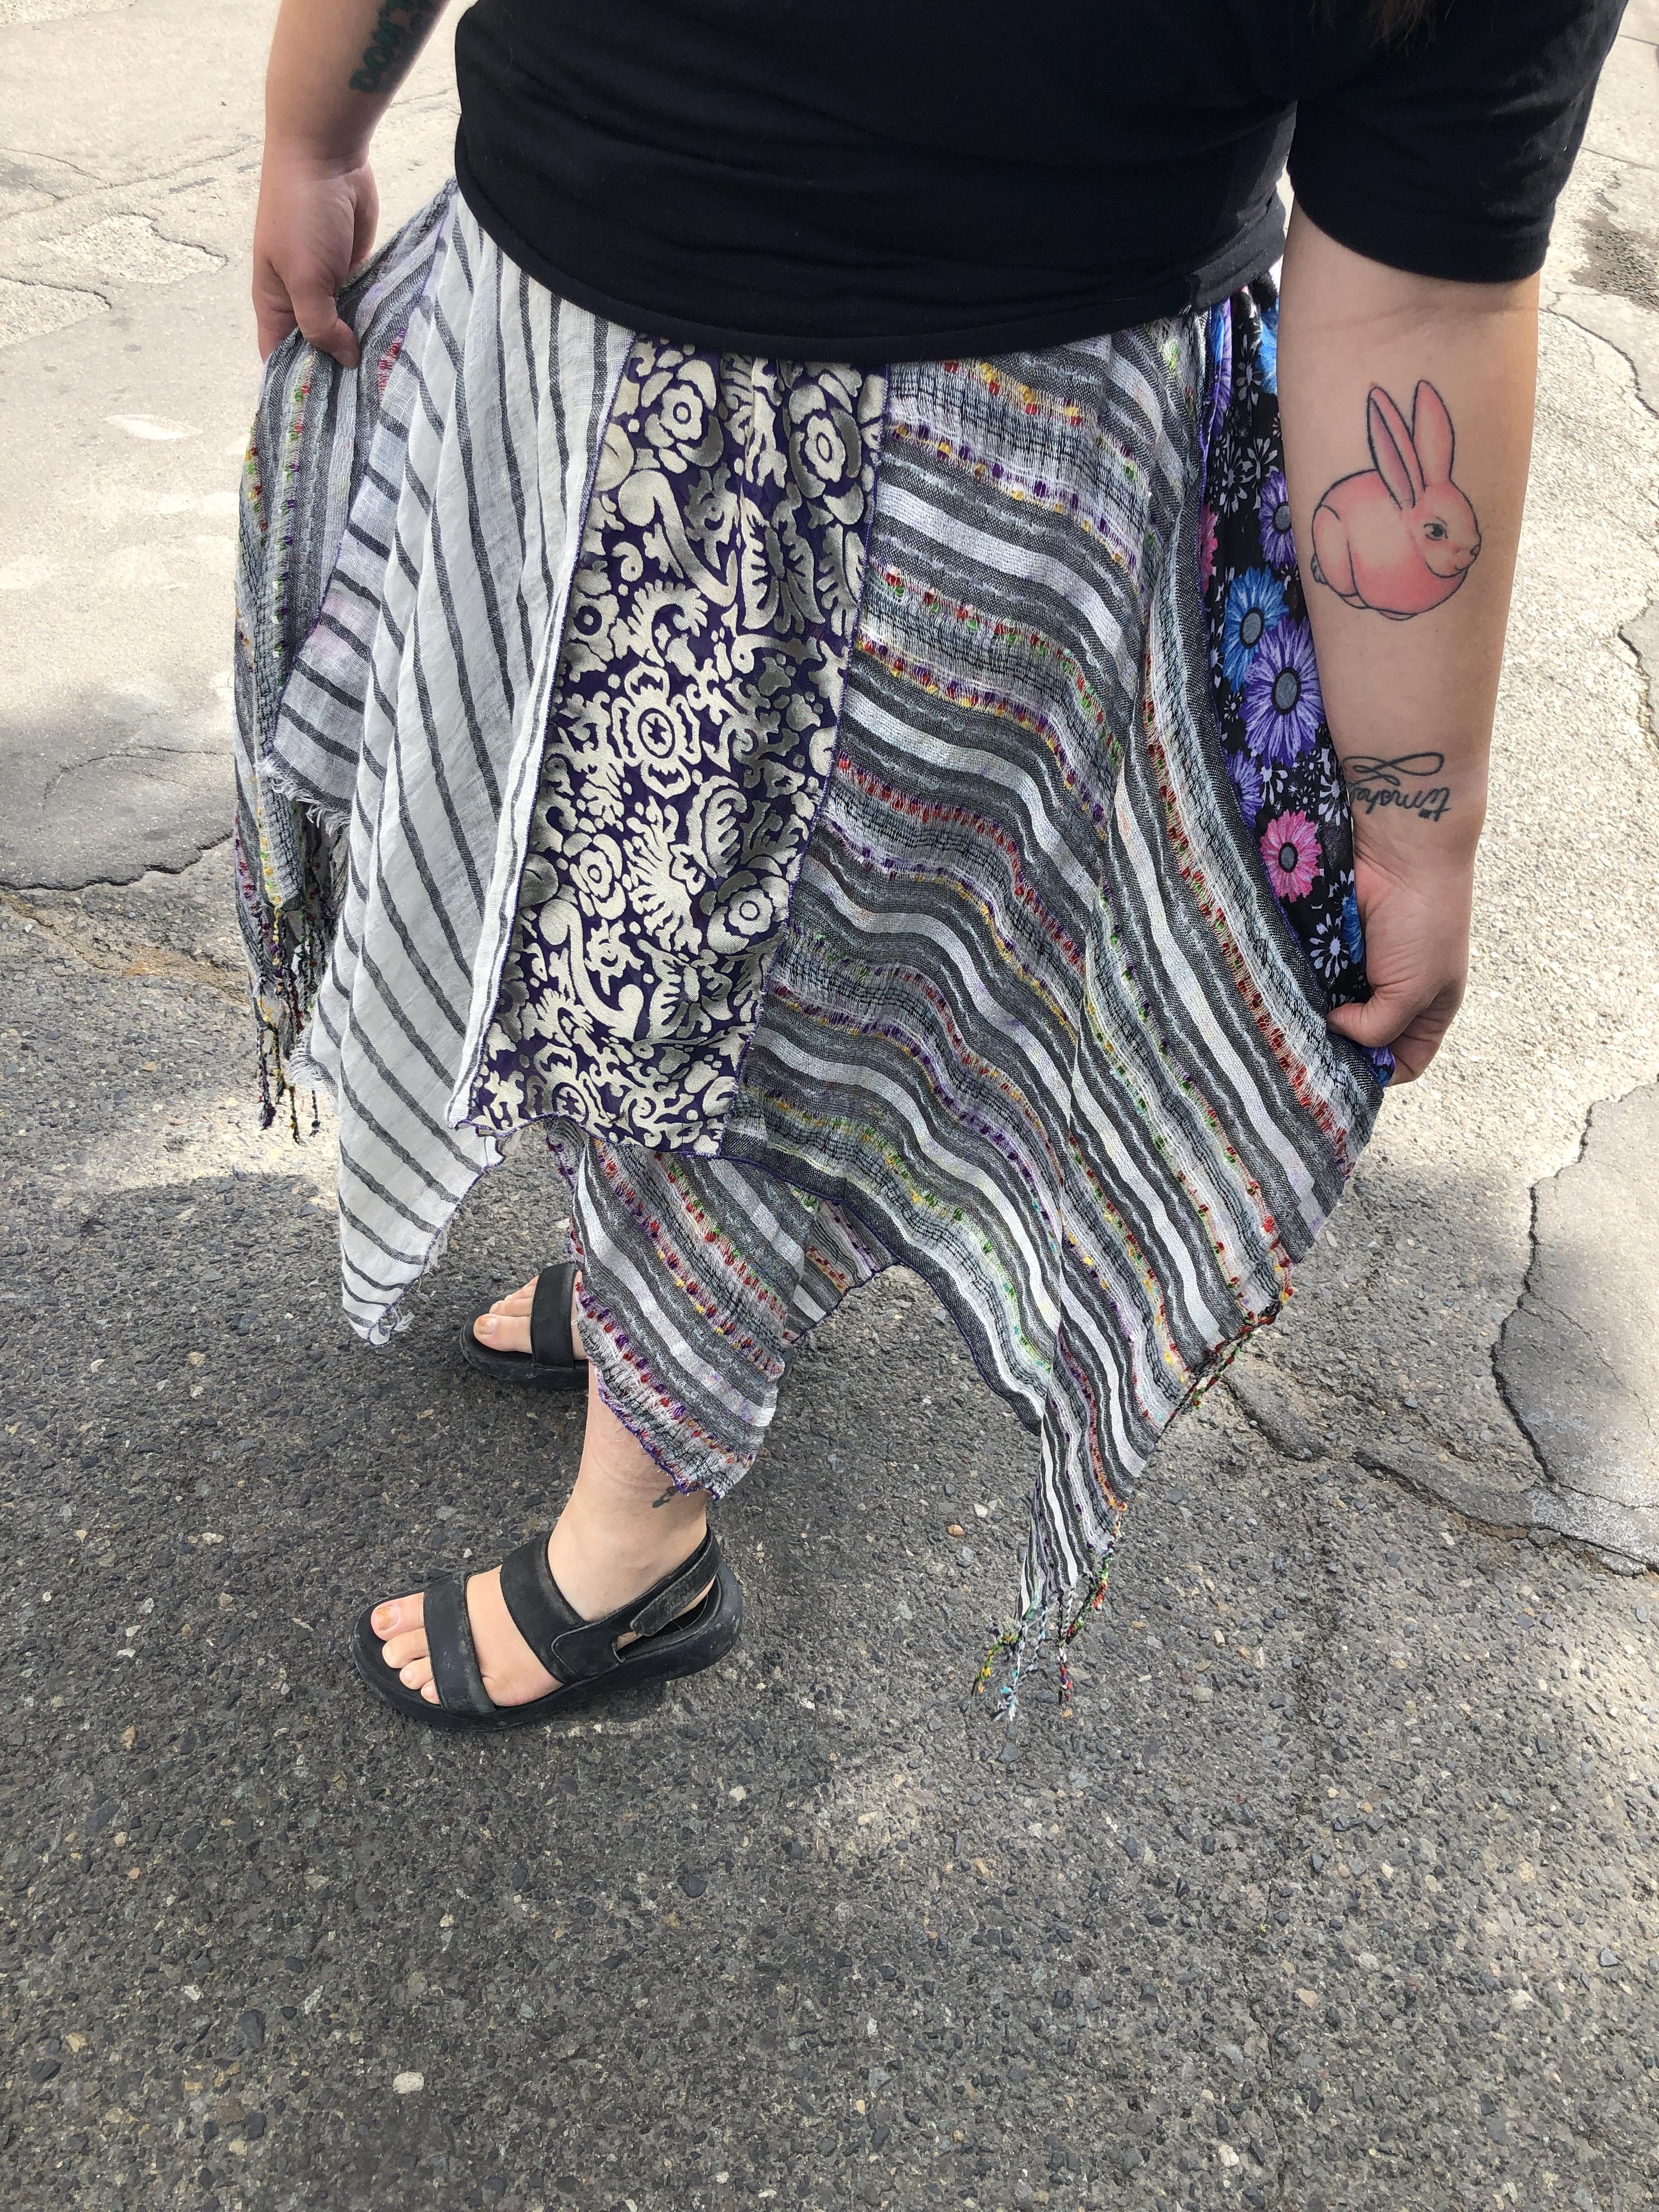 Homemade handkerchief worn by woman in black sandals